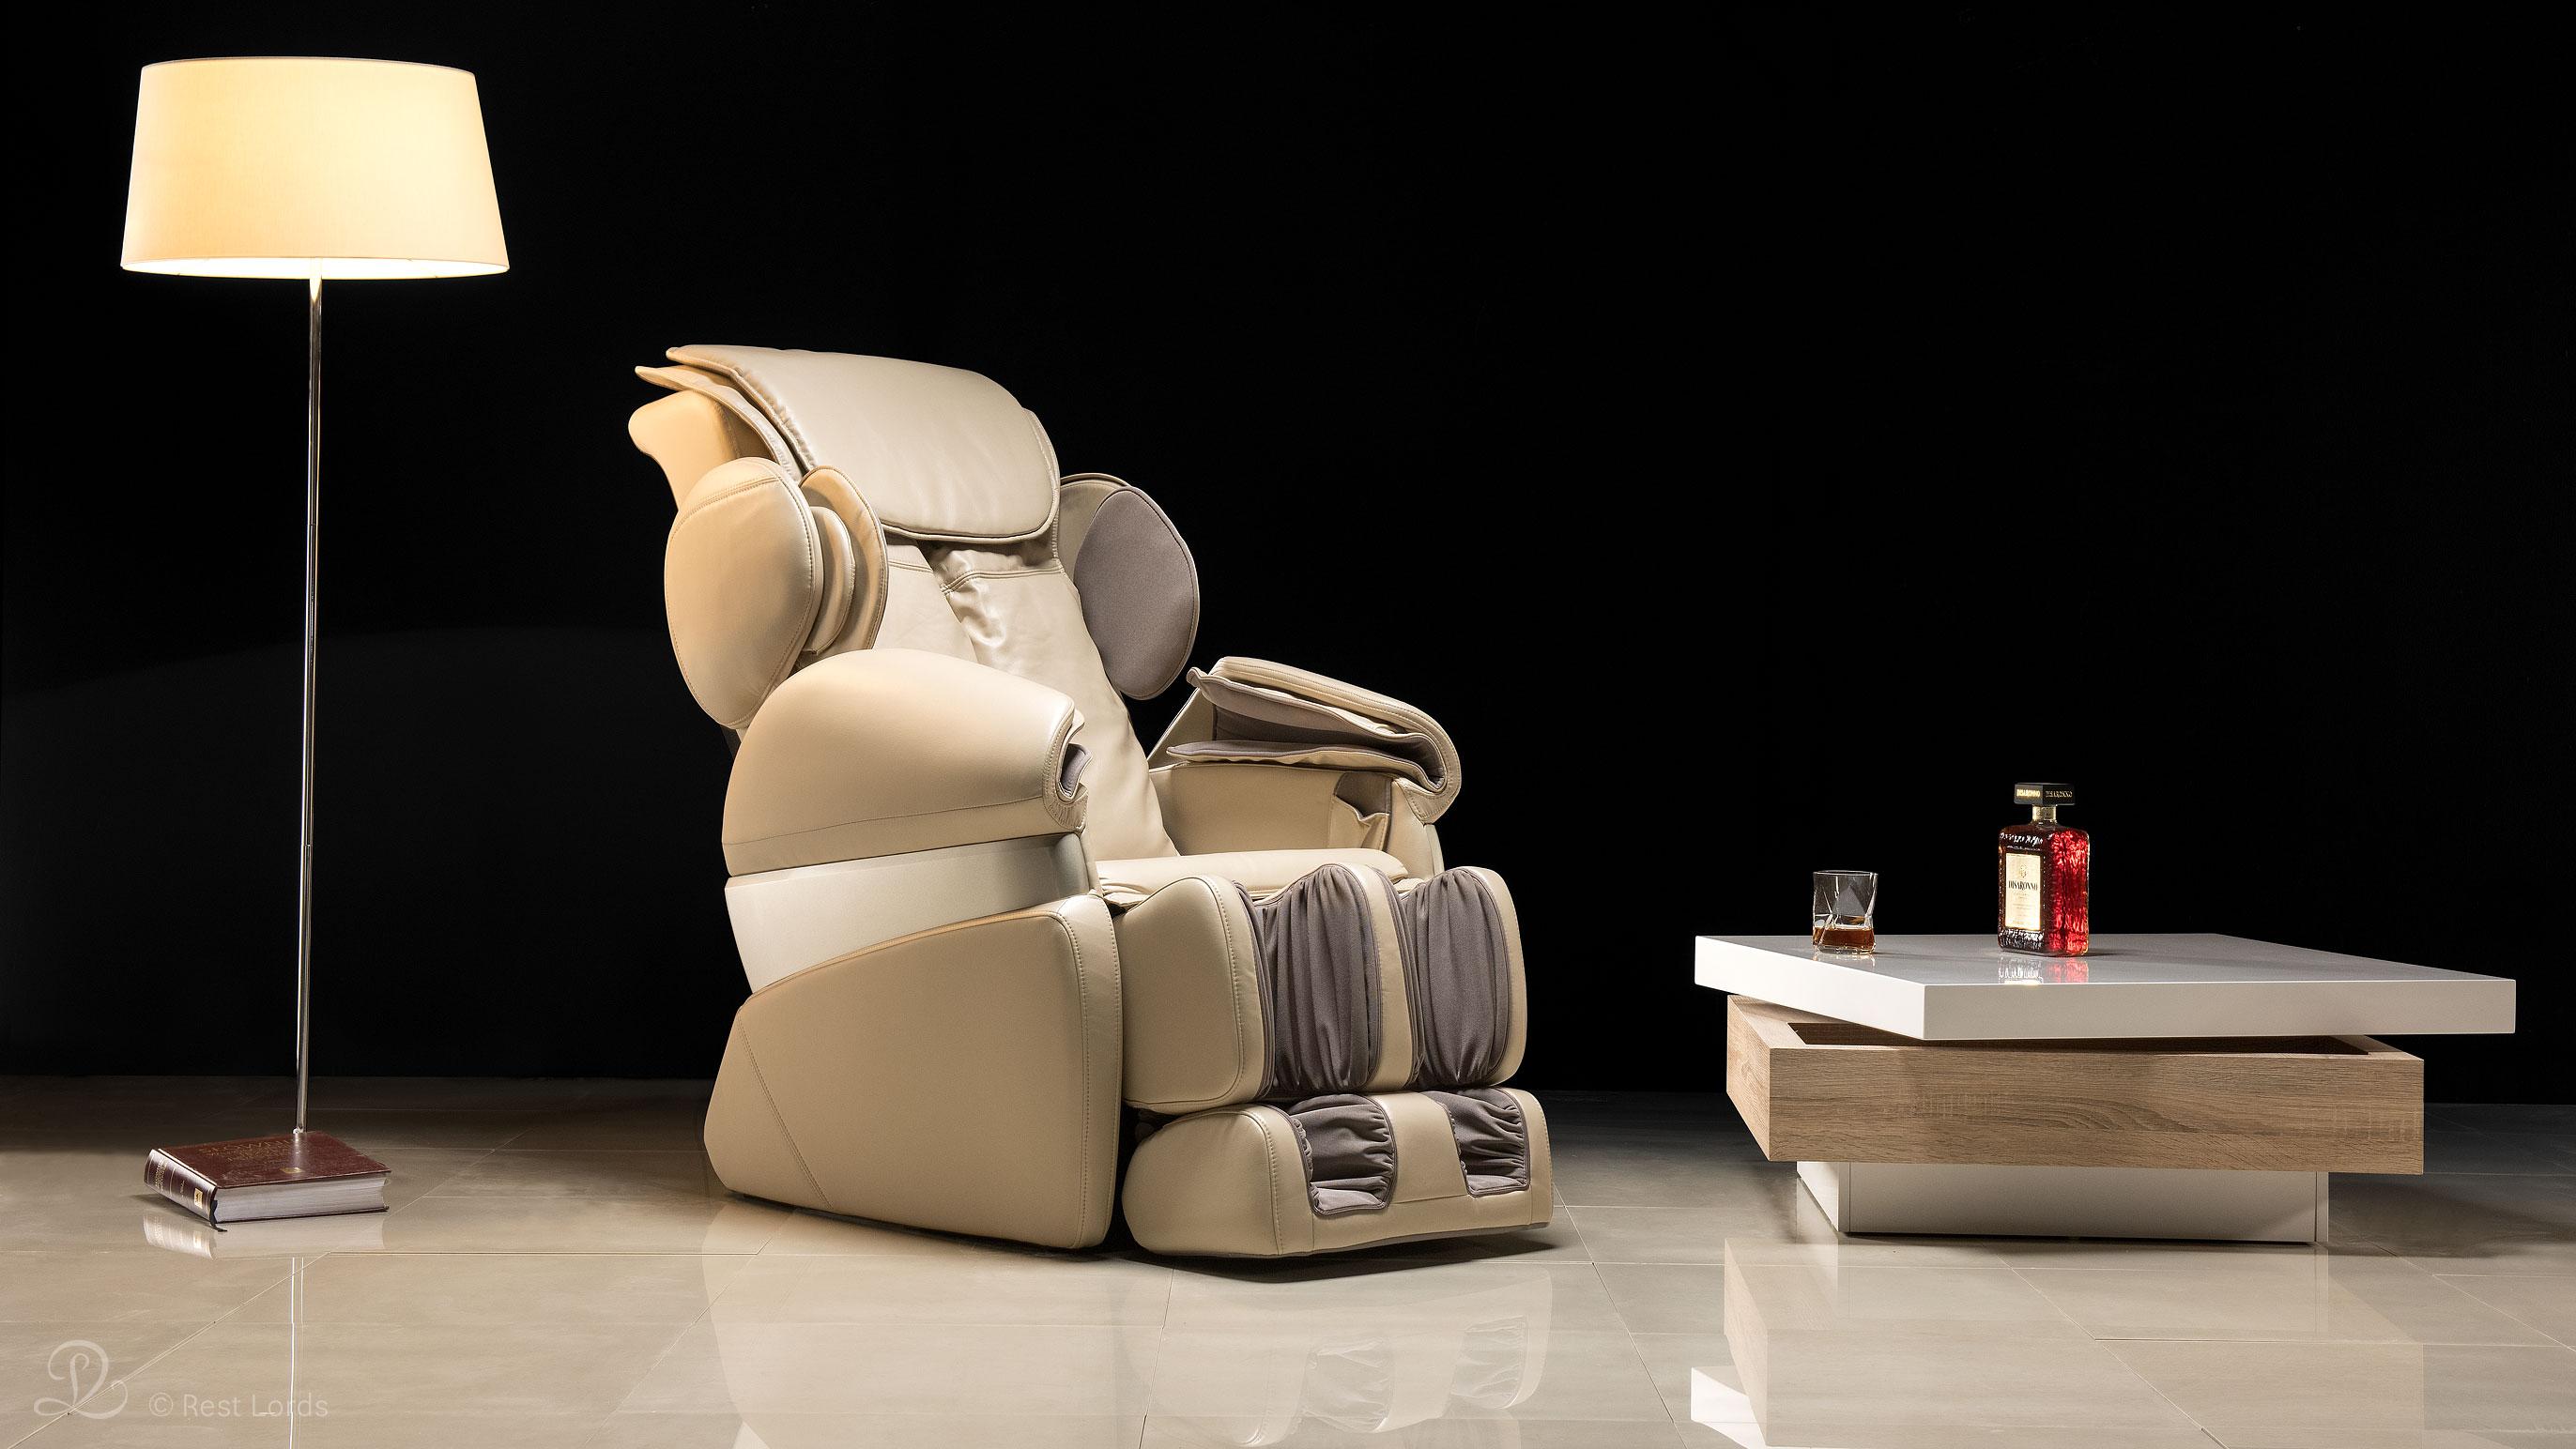 Fotel do masażu Massaggio Conveniente aranżacja